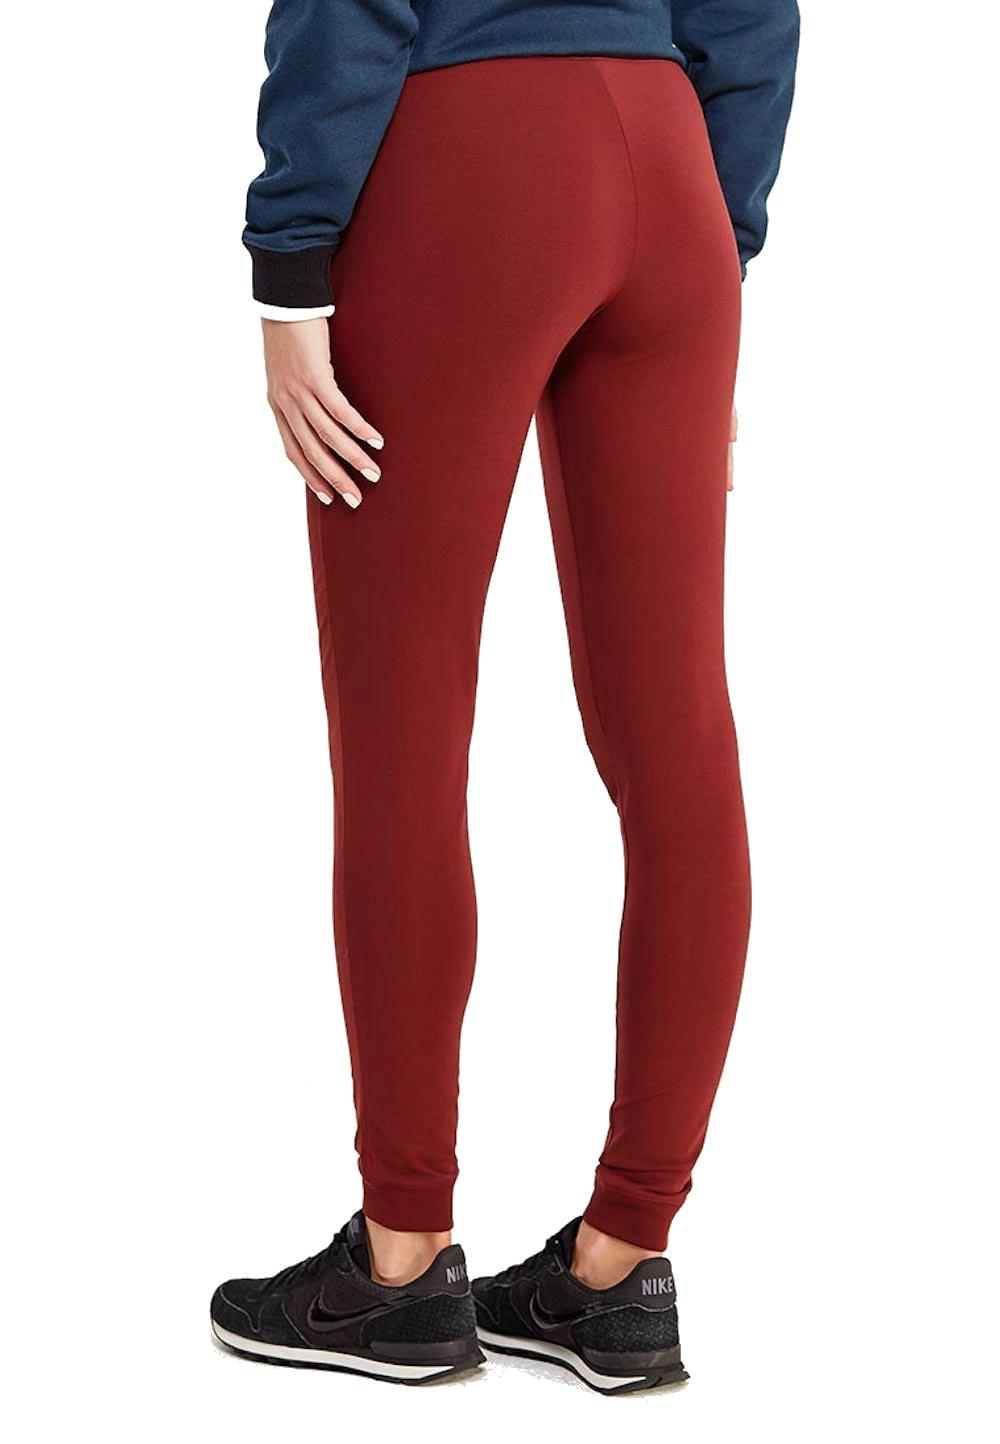 Sport Cuffed De Nike Femme Jersey Pantalon Pour ARIwZq8